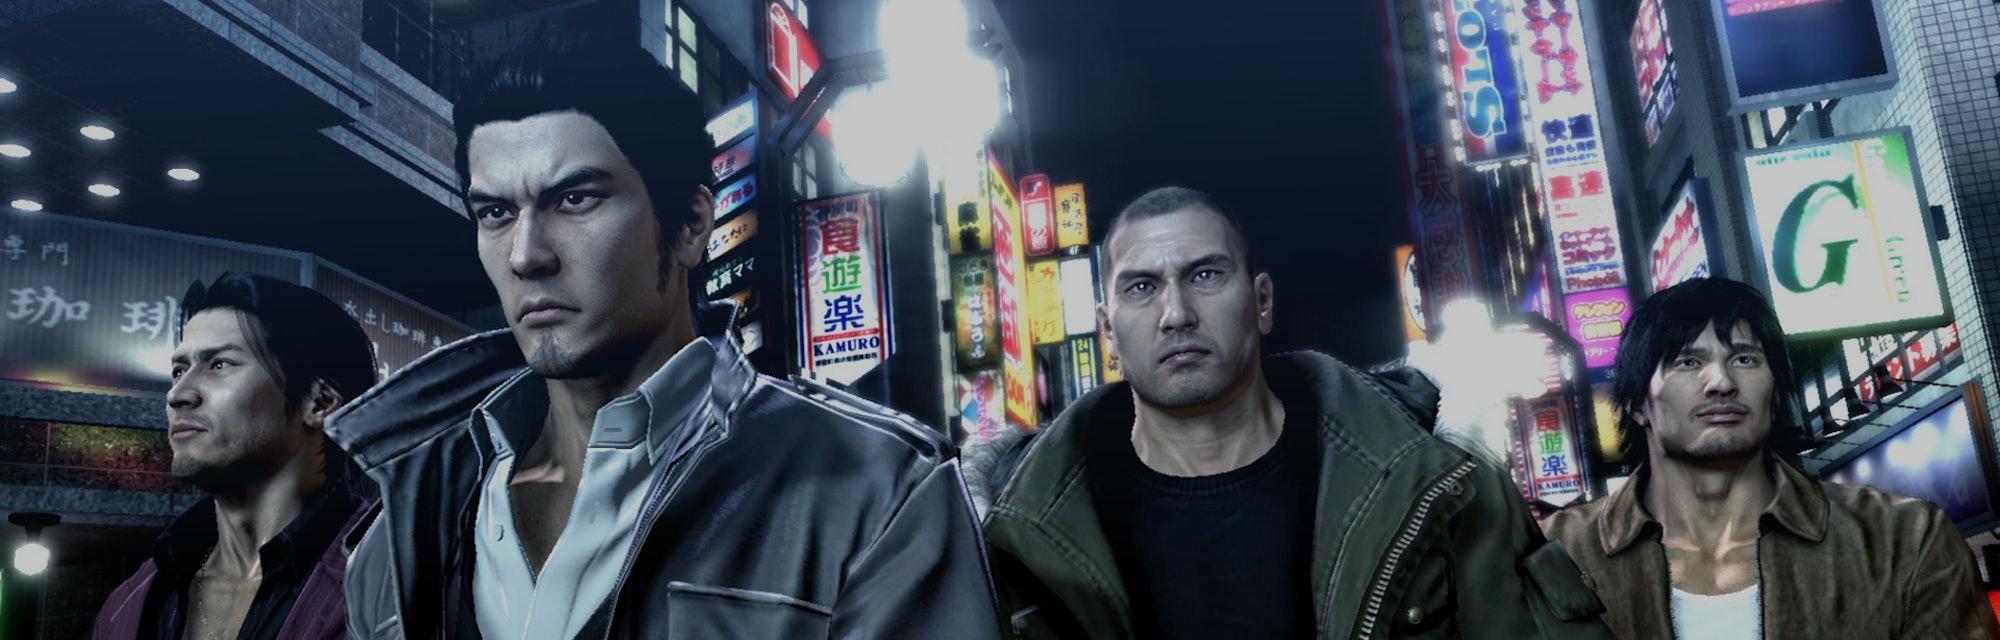 A screenshot from Yakuza 4